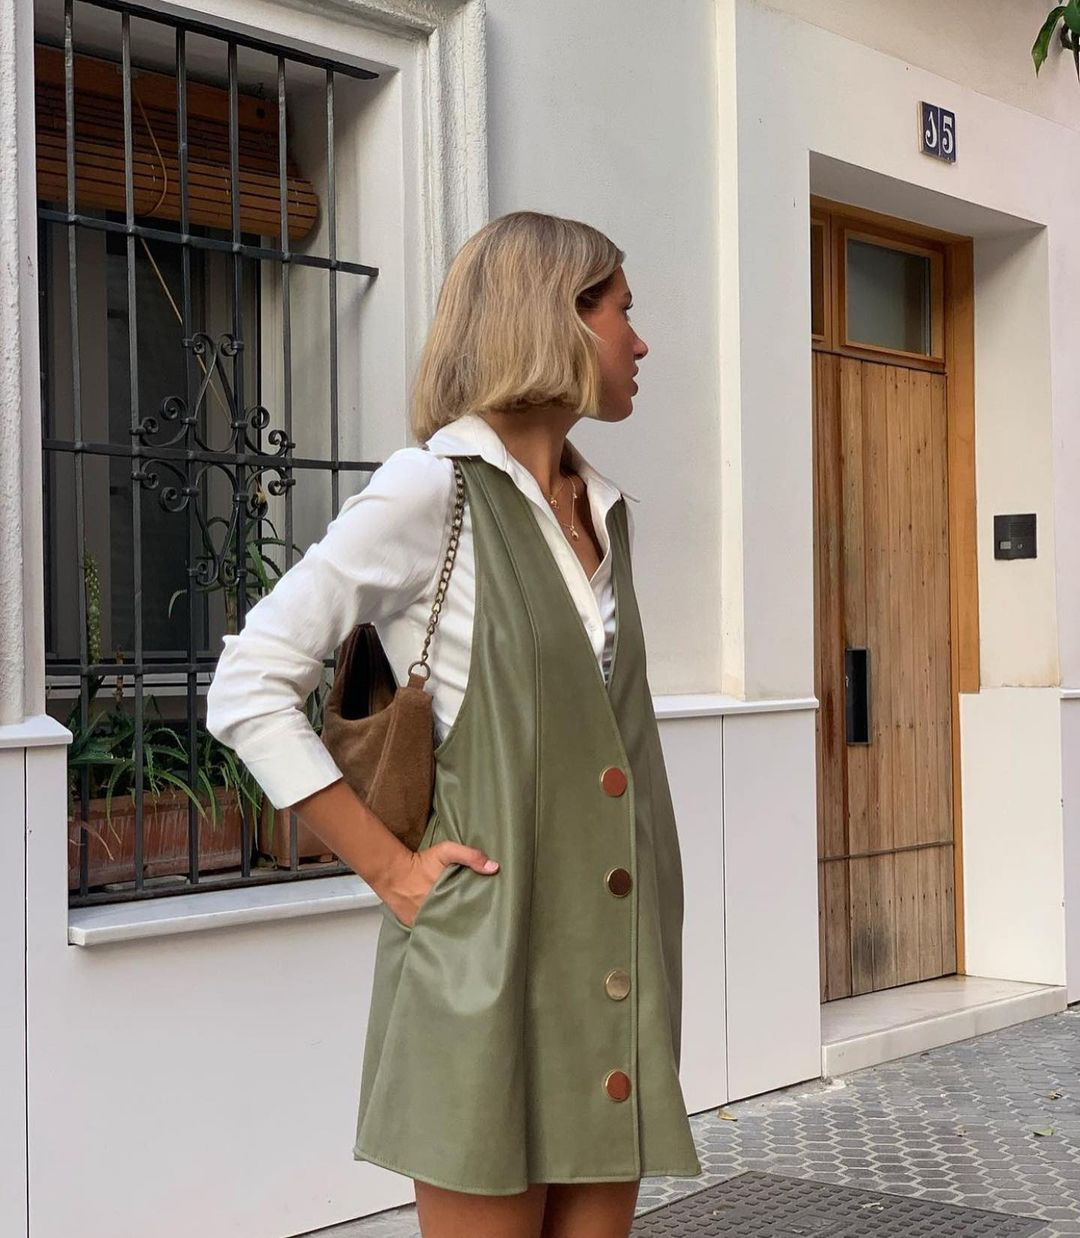 jupe style robe-salopette en matière synthétique de Zara sur zaraaddiction